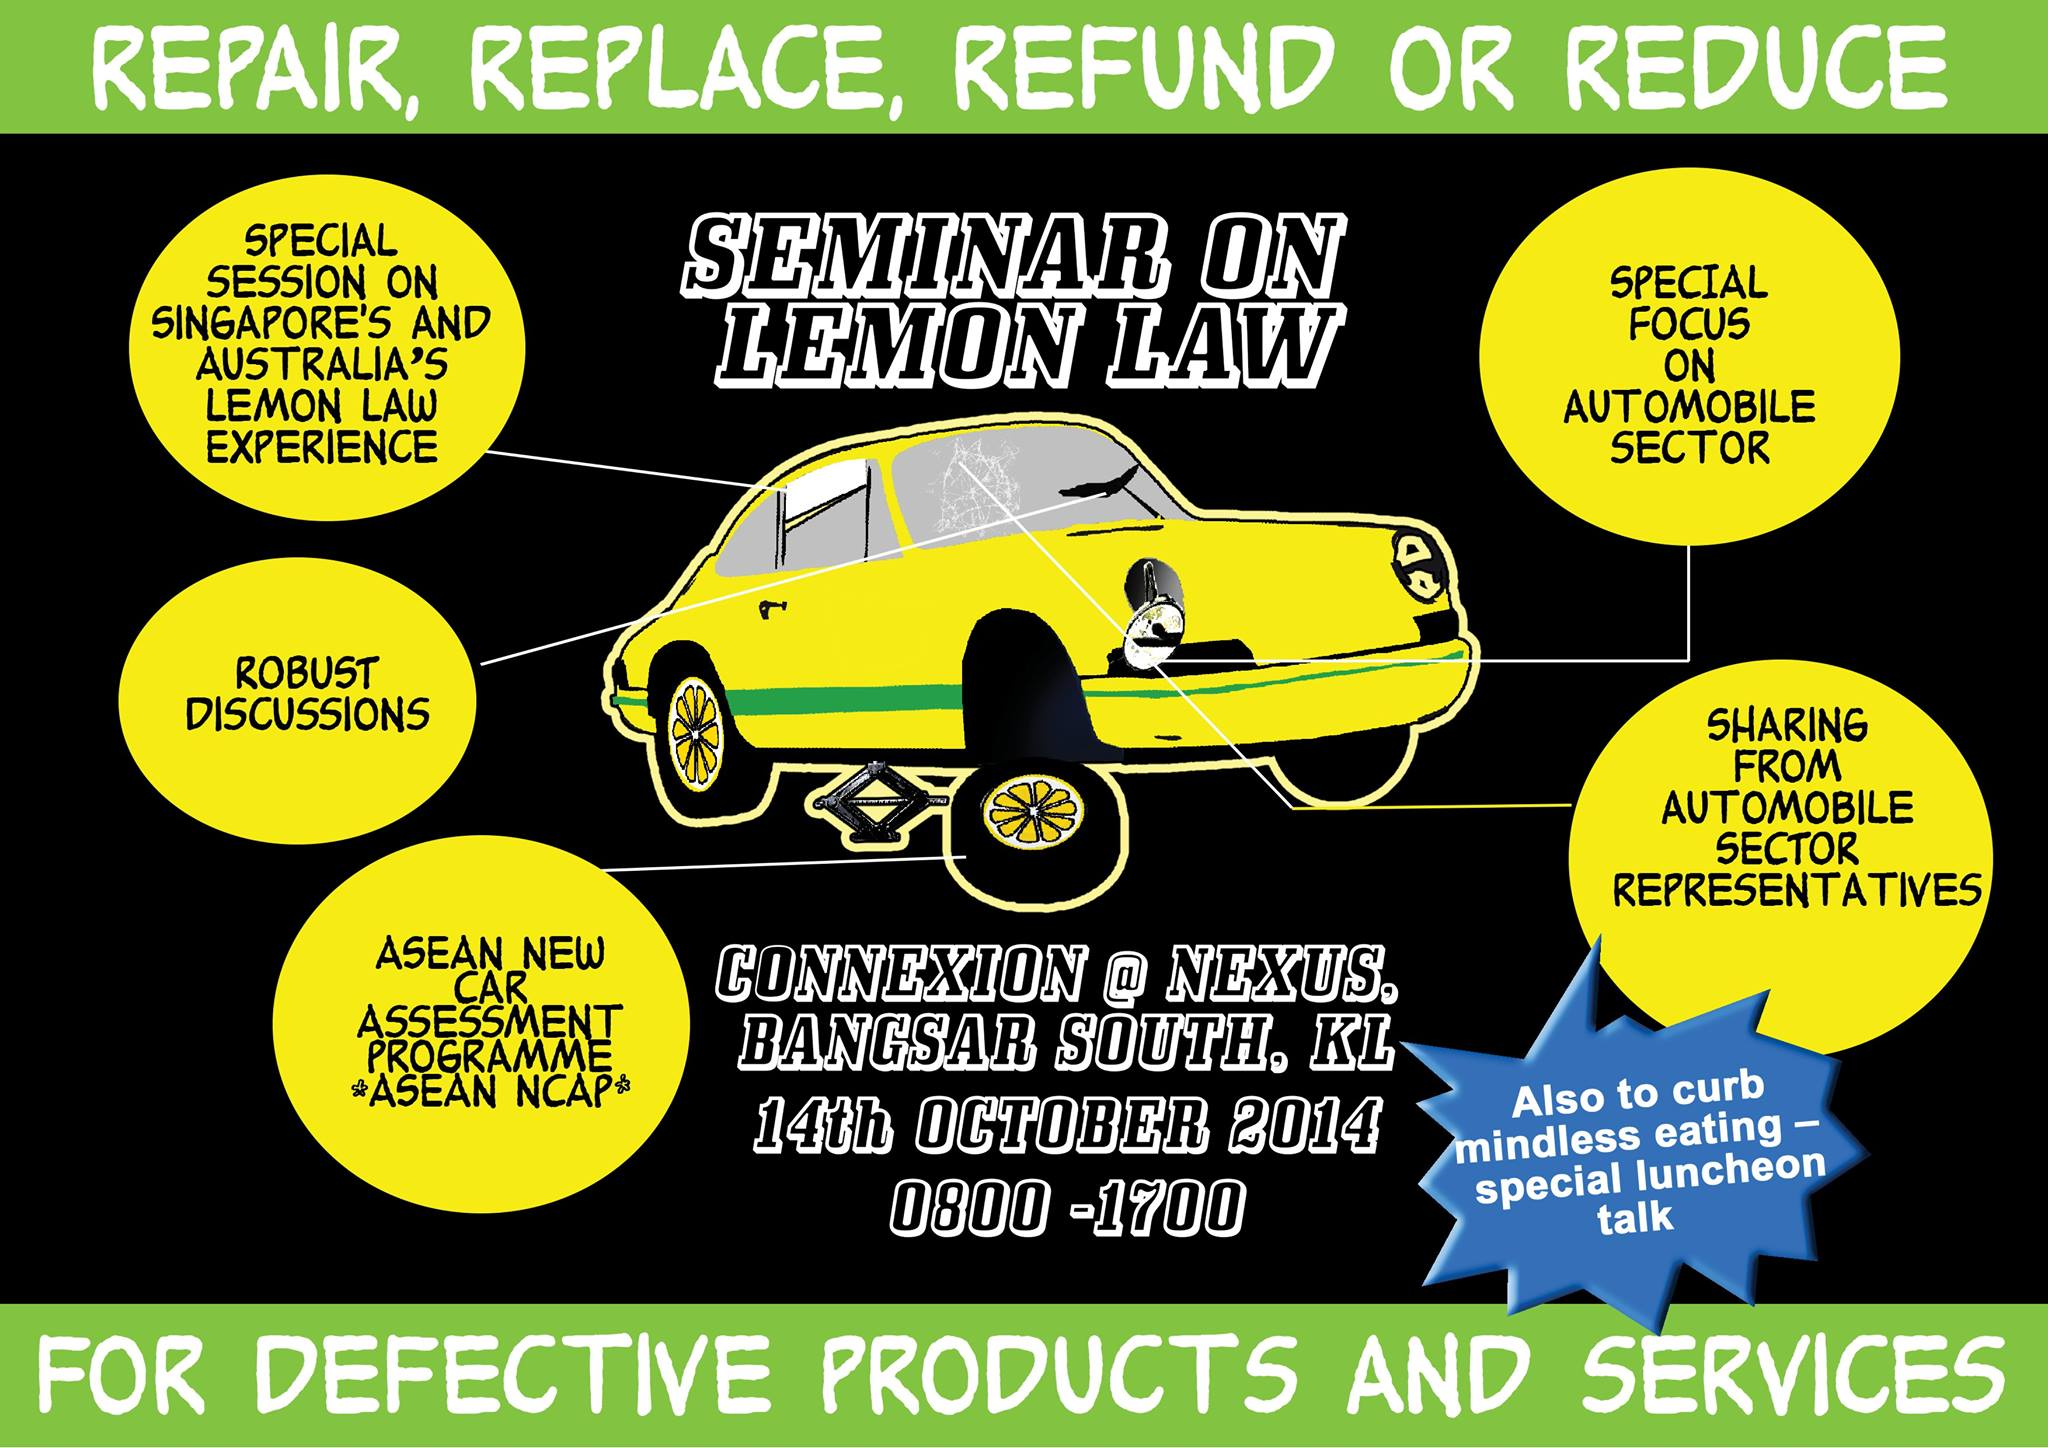 Establish lemon laws to protect car buyers - Standards Users